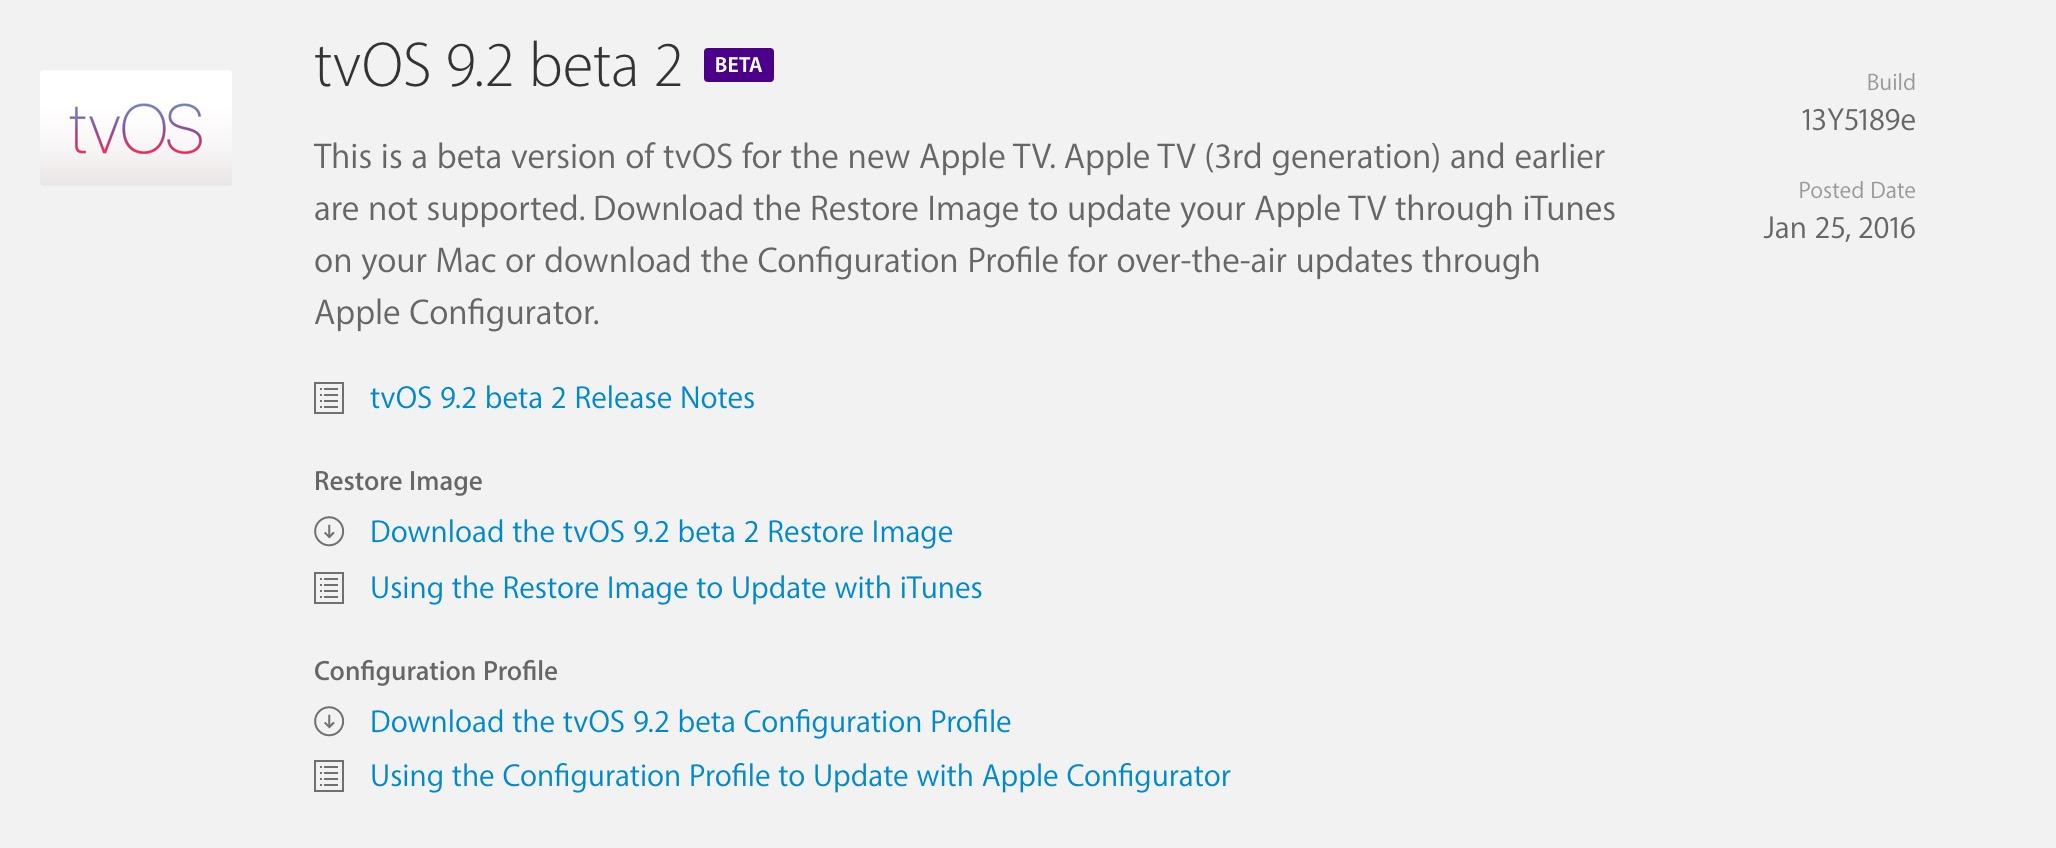 tvOS 9.2 beta 2